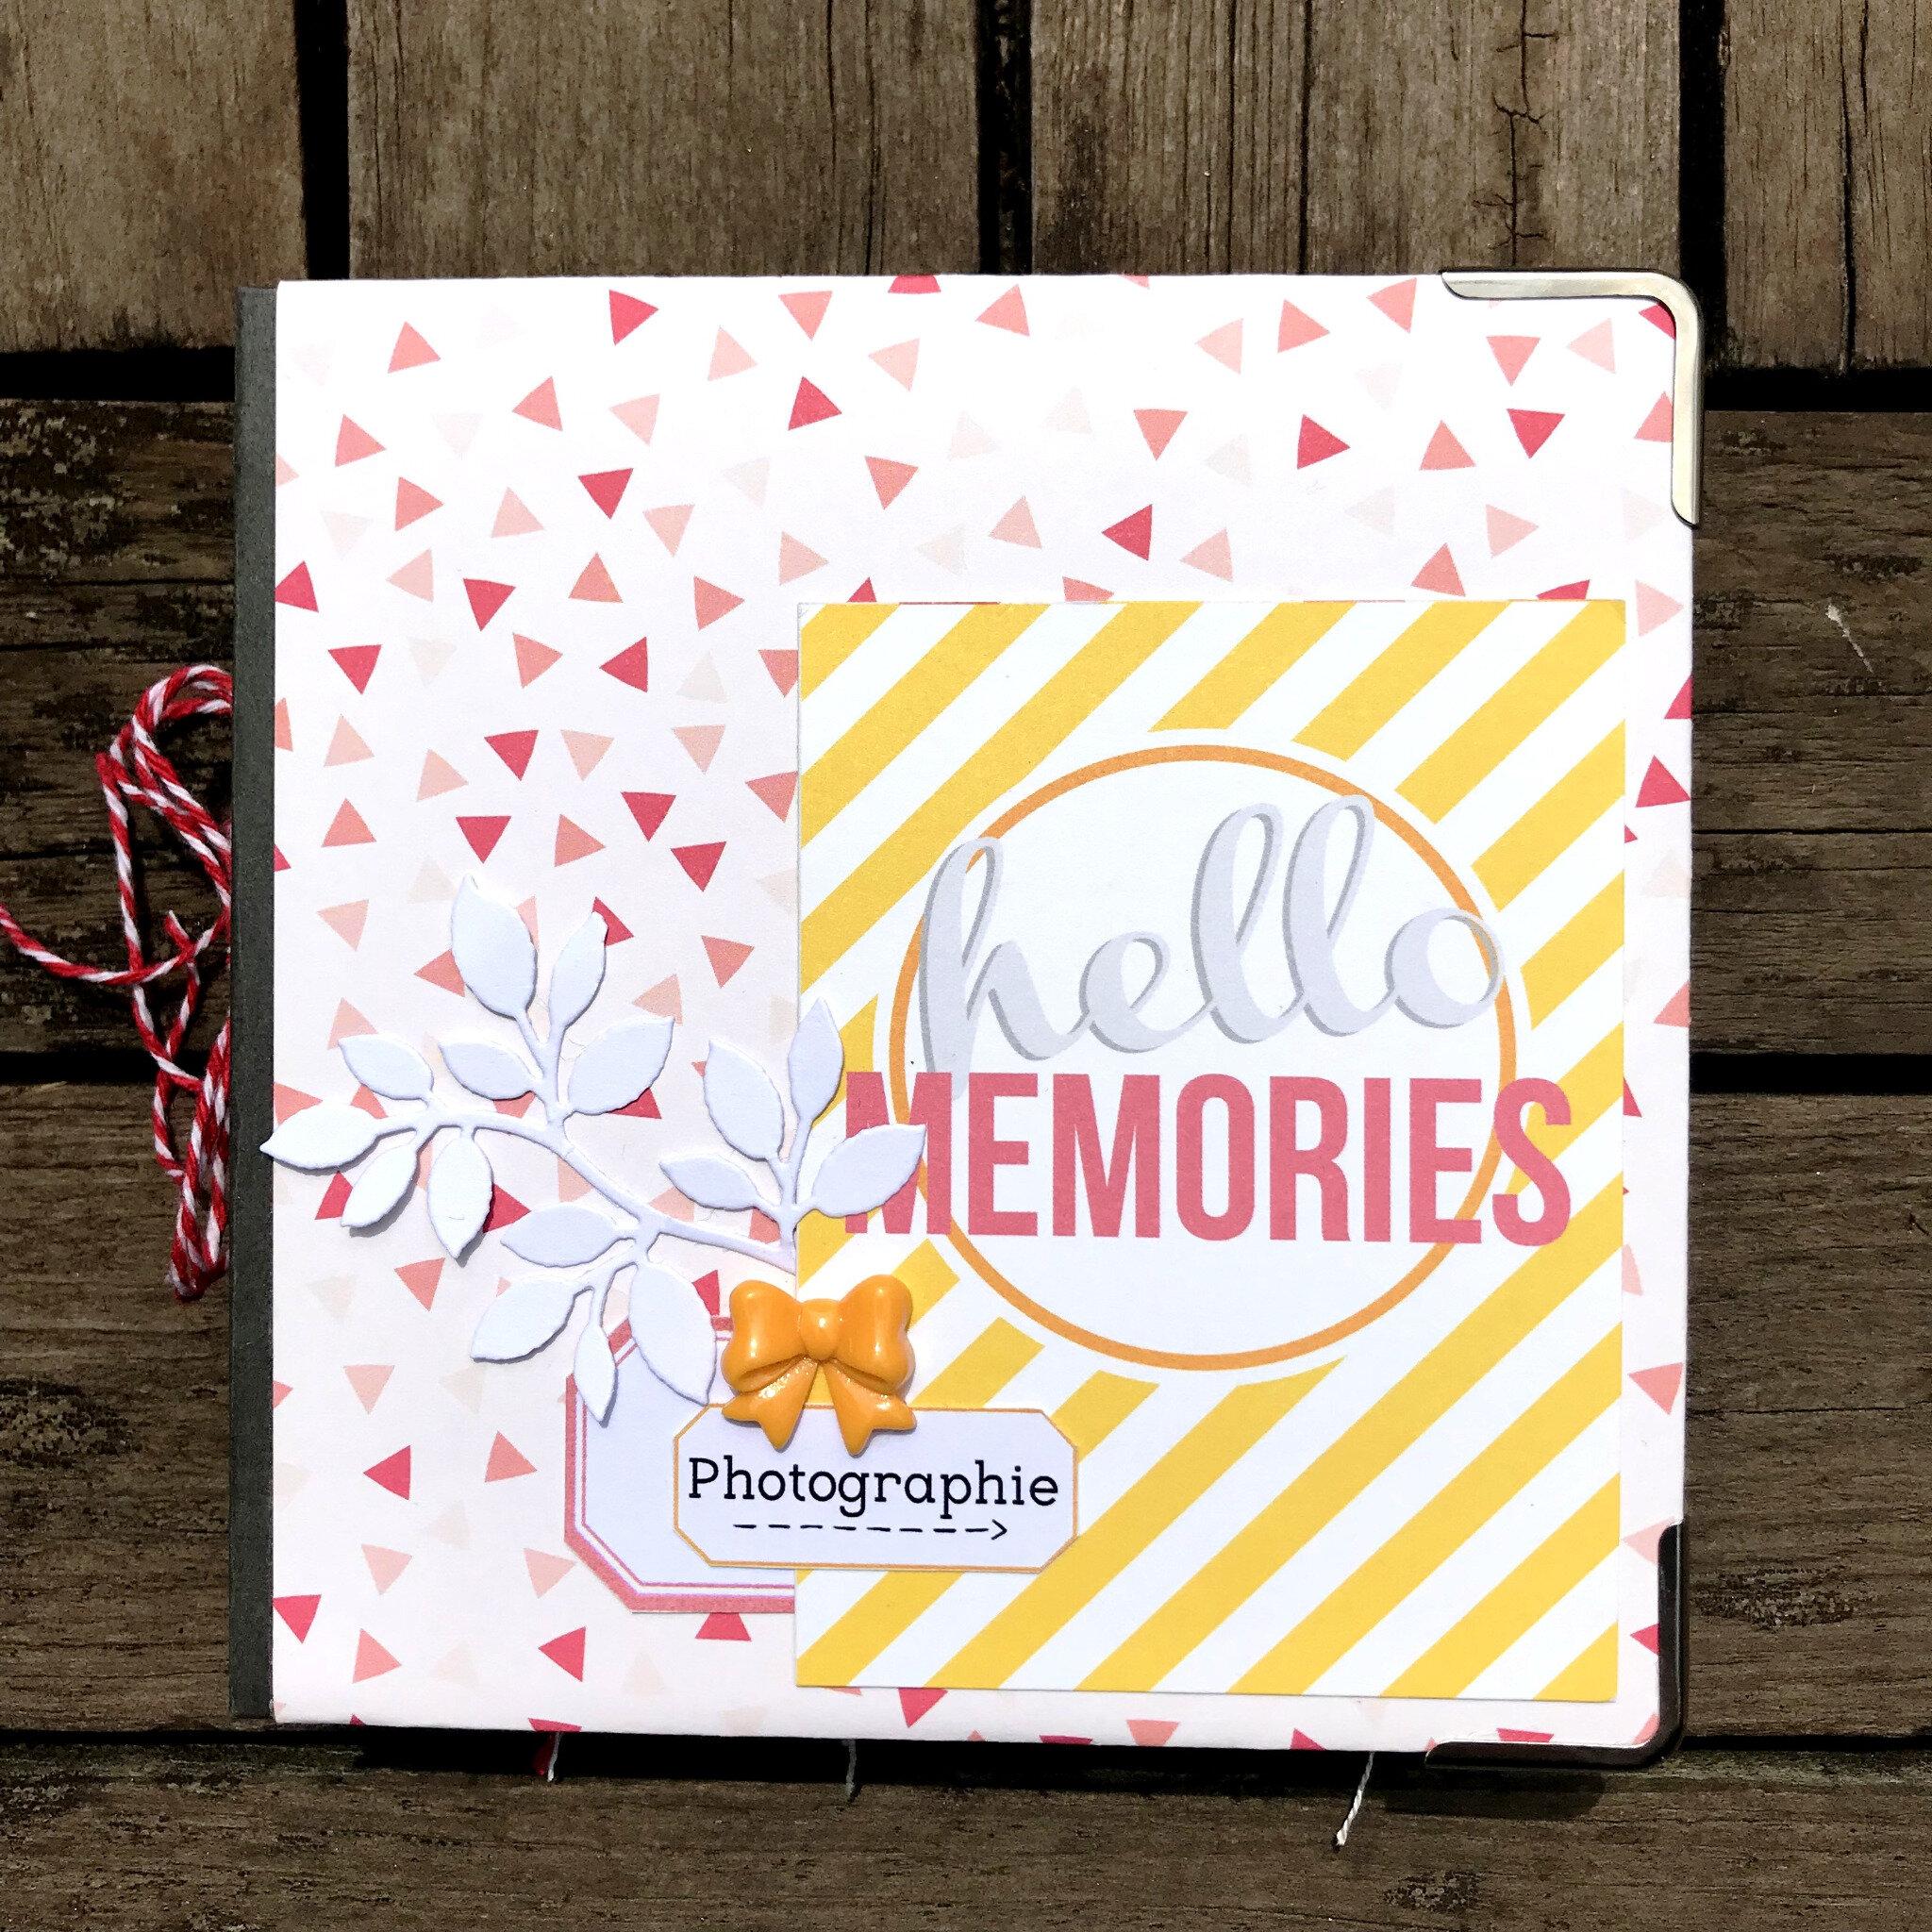 Mini Hello memories (01)